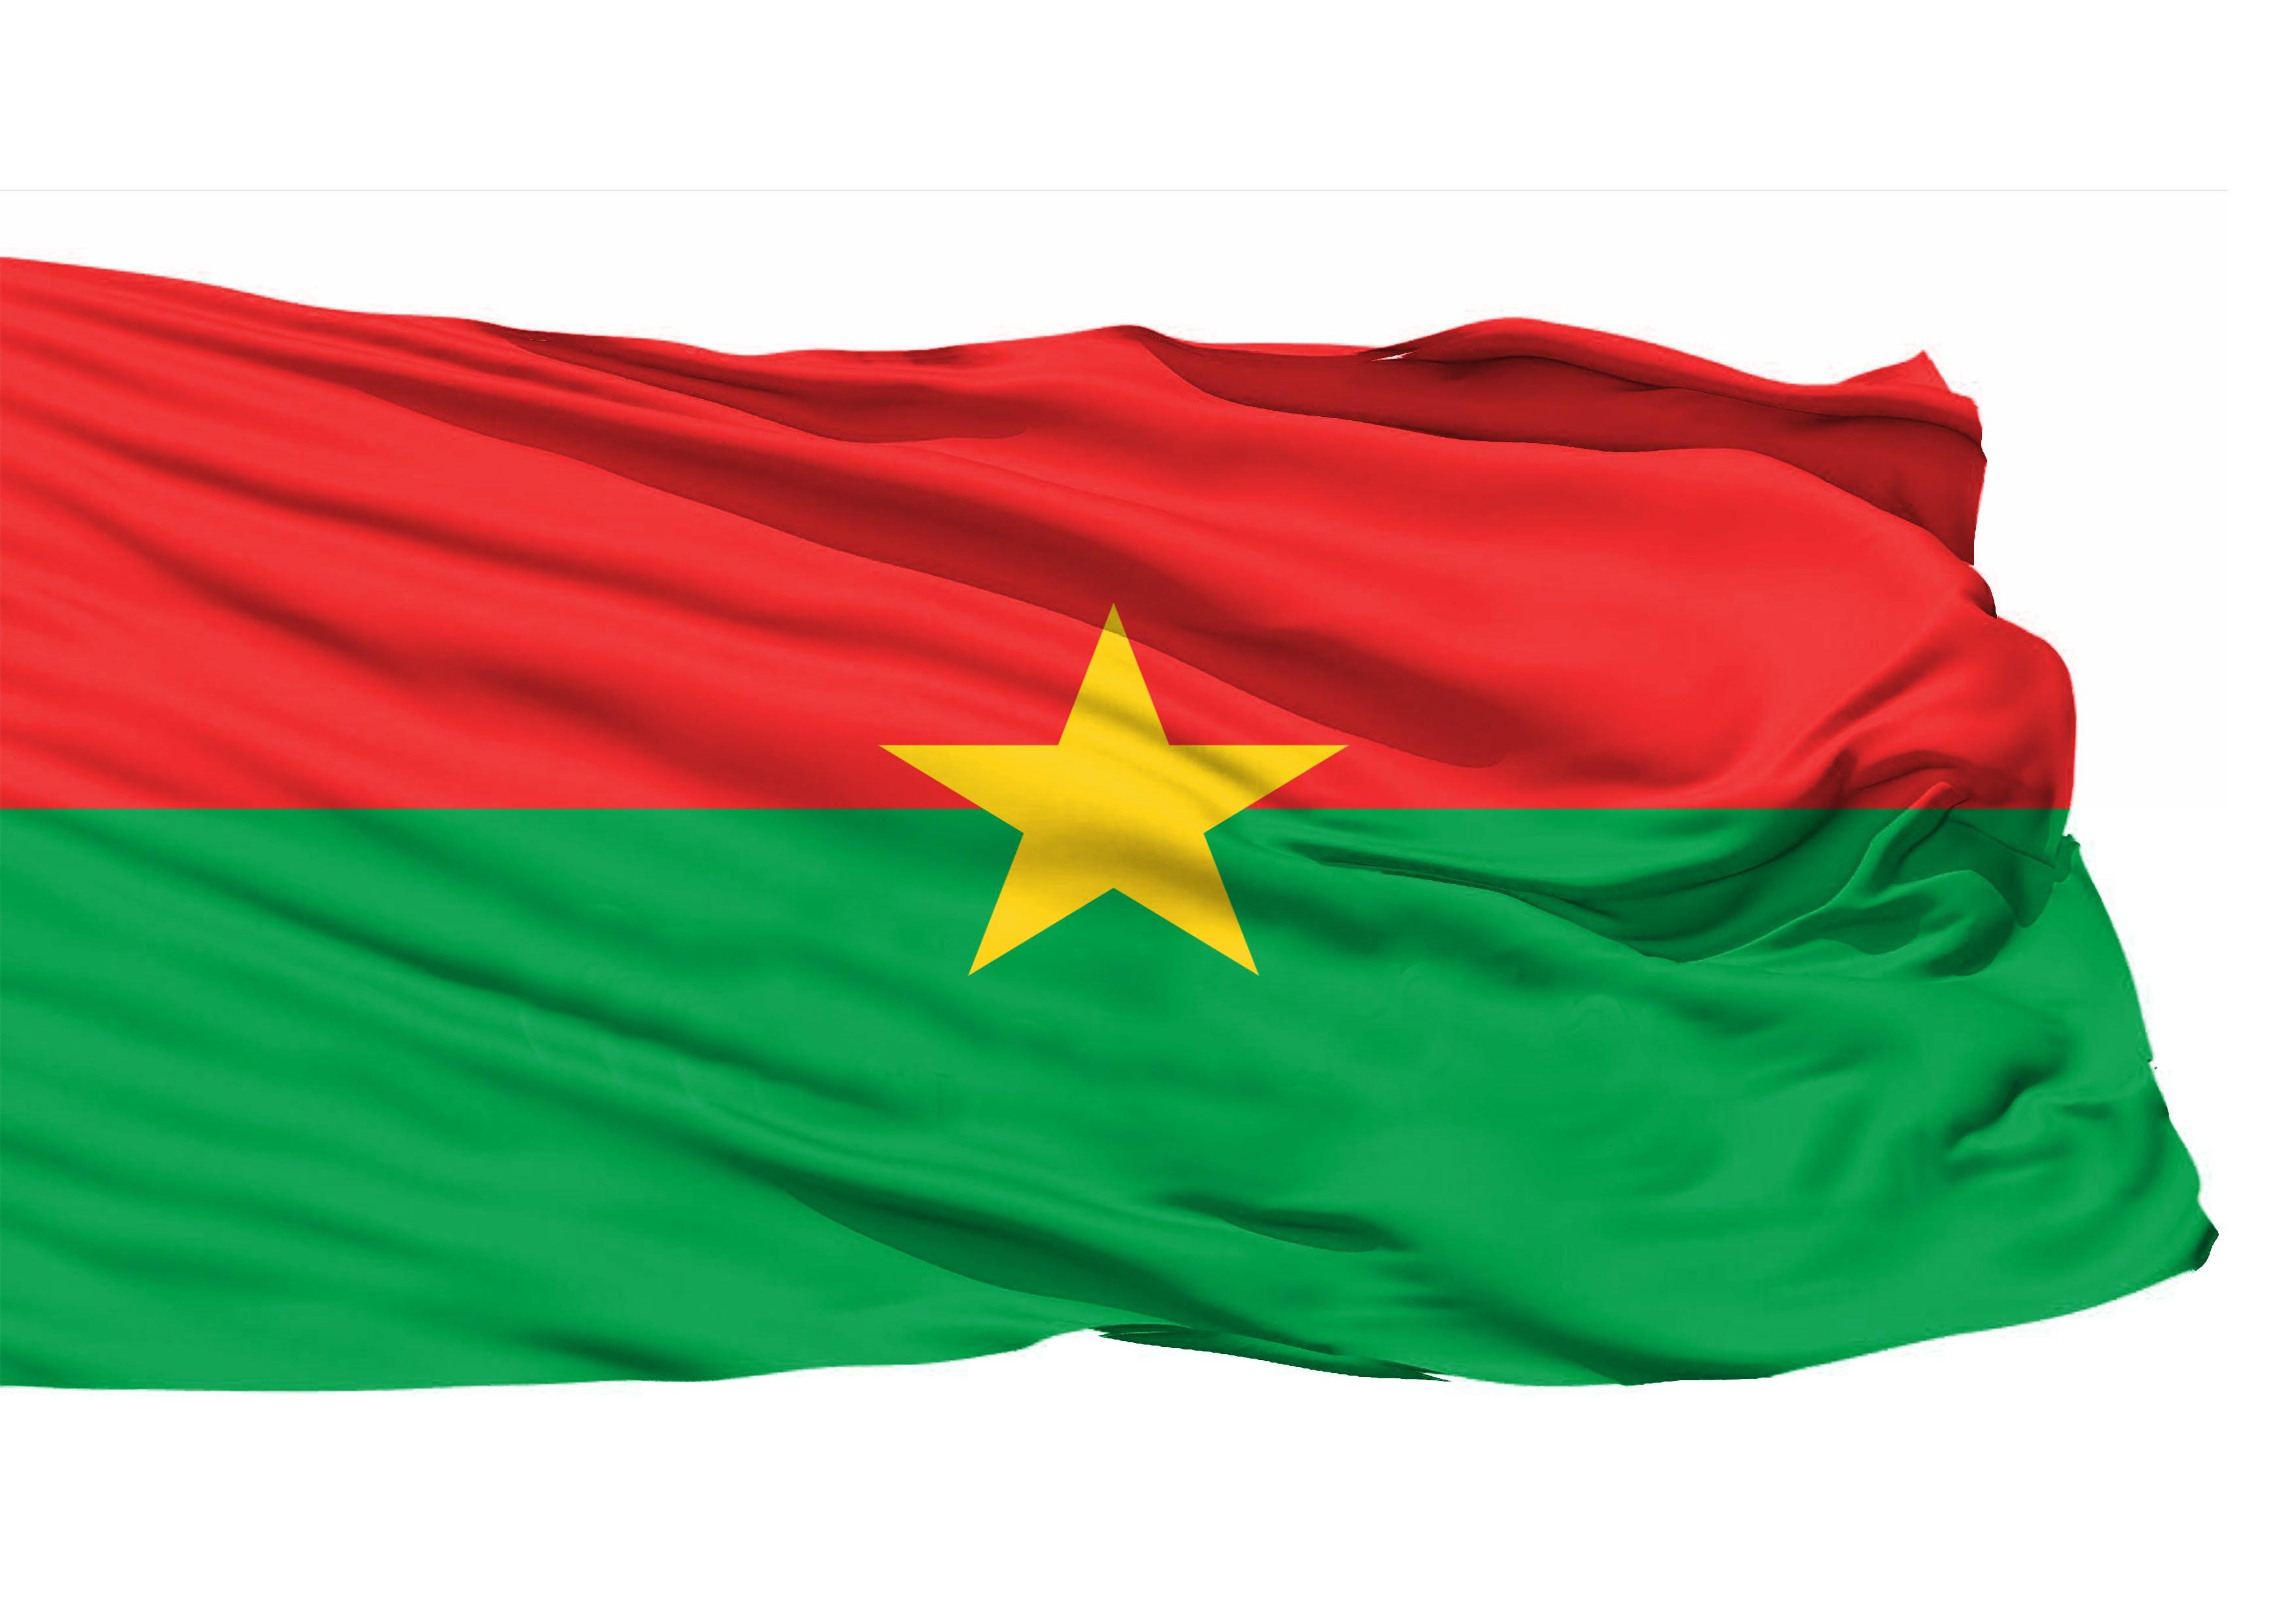 Kostenloses Stock Foto zu flagge, nationalflagge, 3d-flagge, burkina faso 3d-flagge